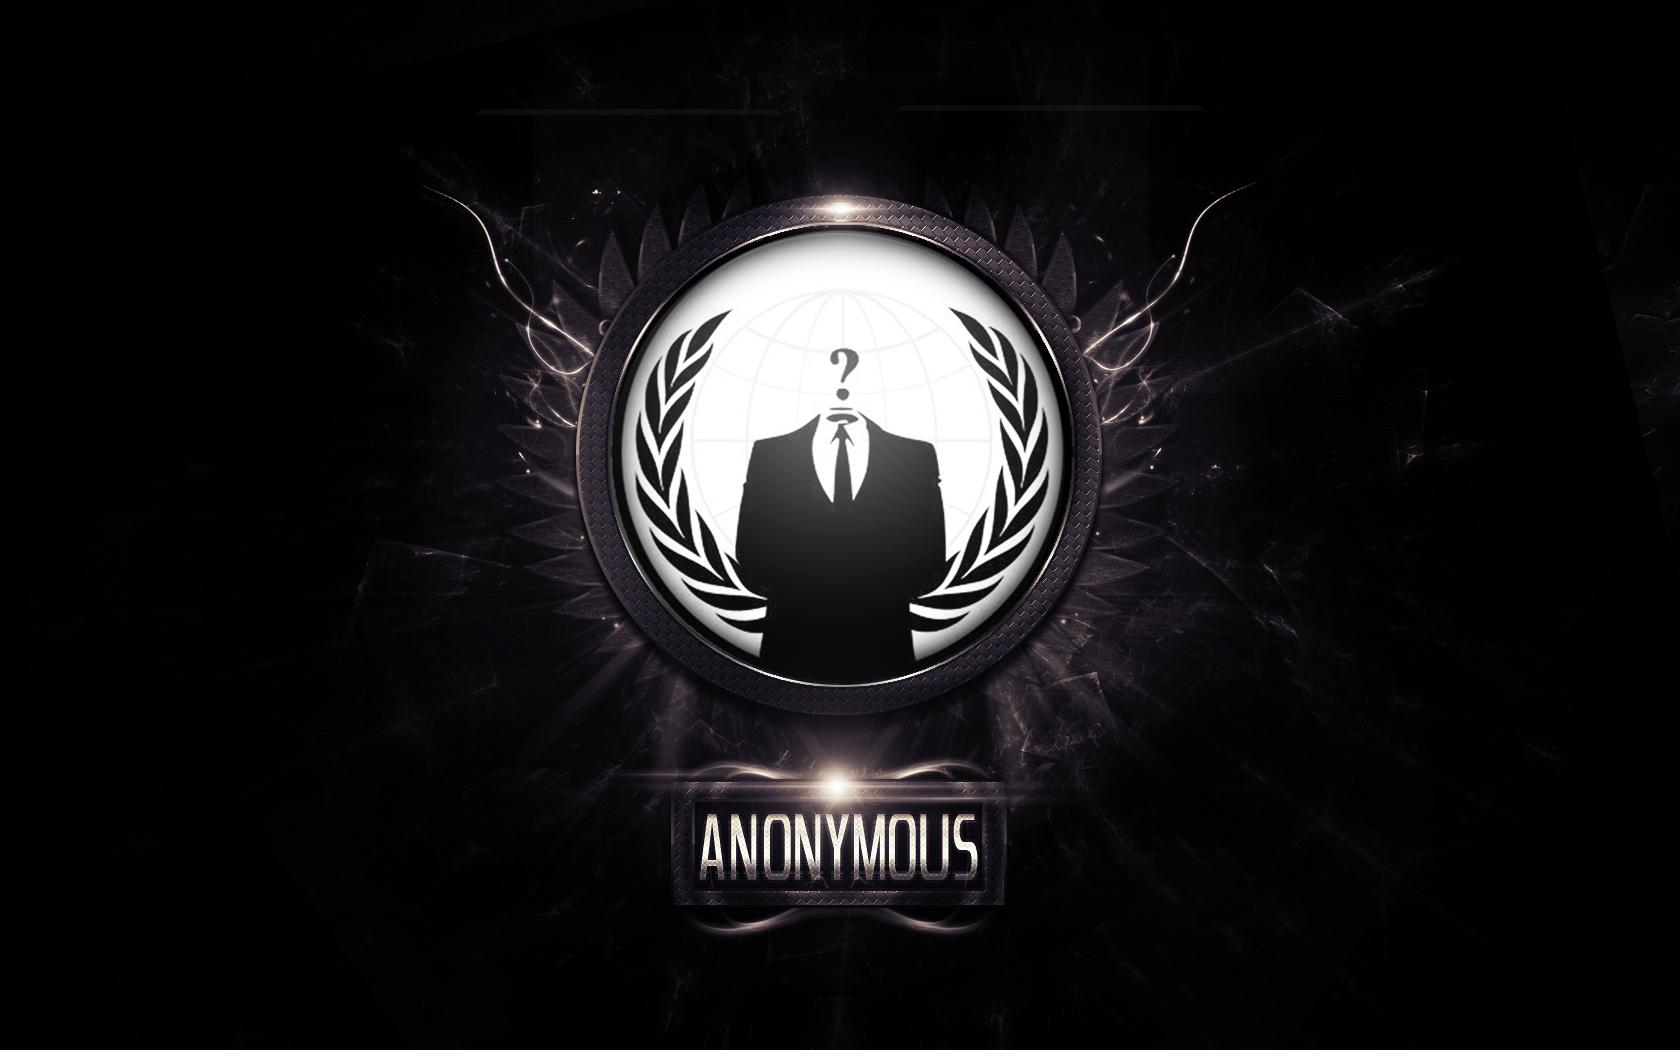 Anonymous hd masa st resimleri hd wallpapers - Background anonymous ...